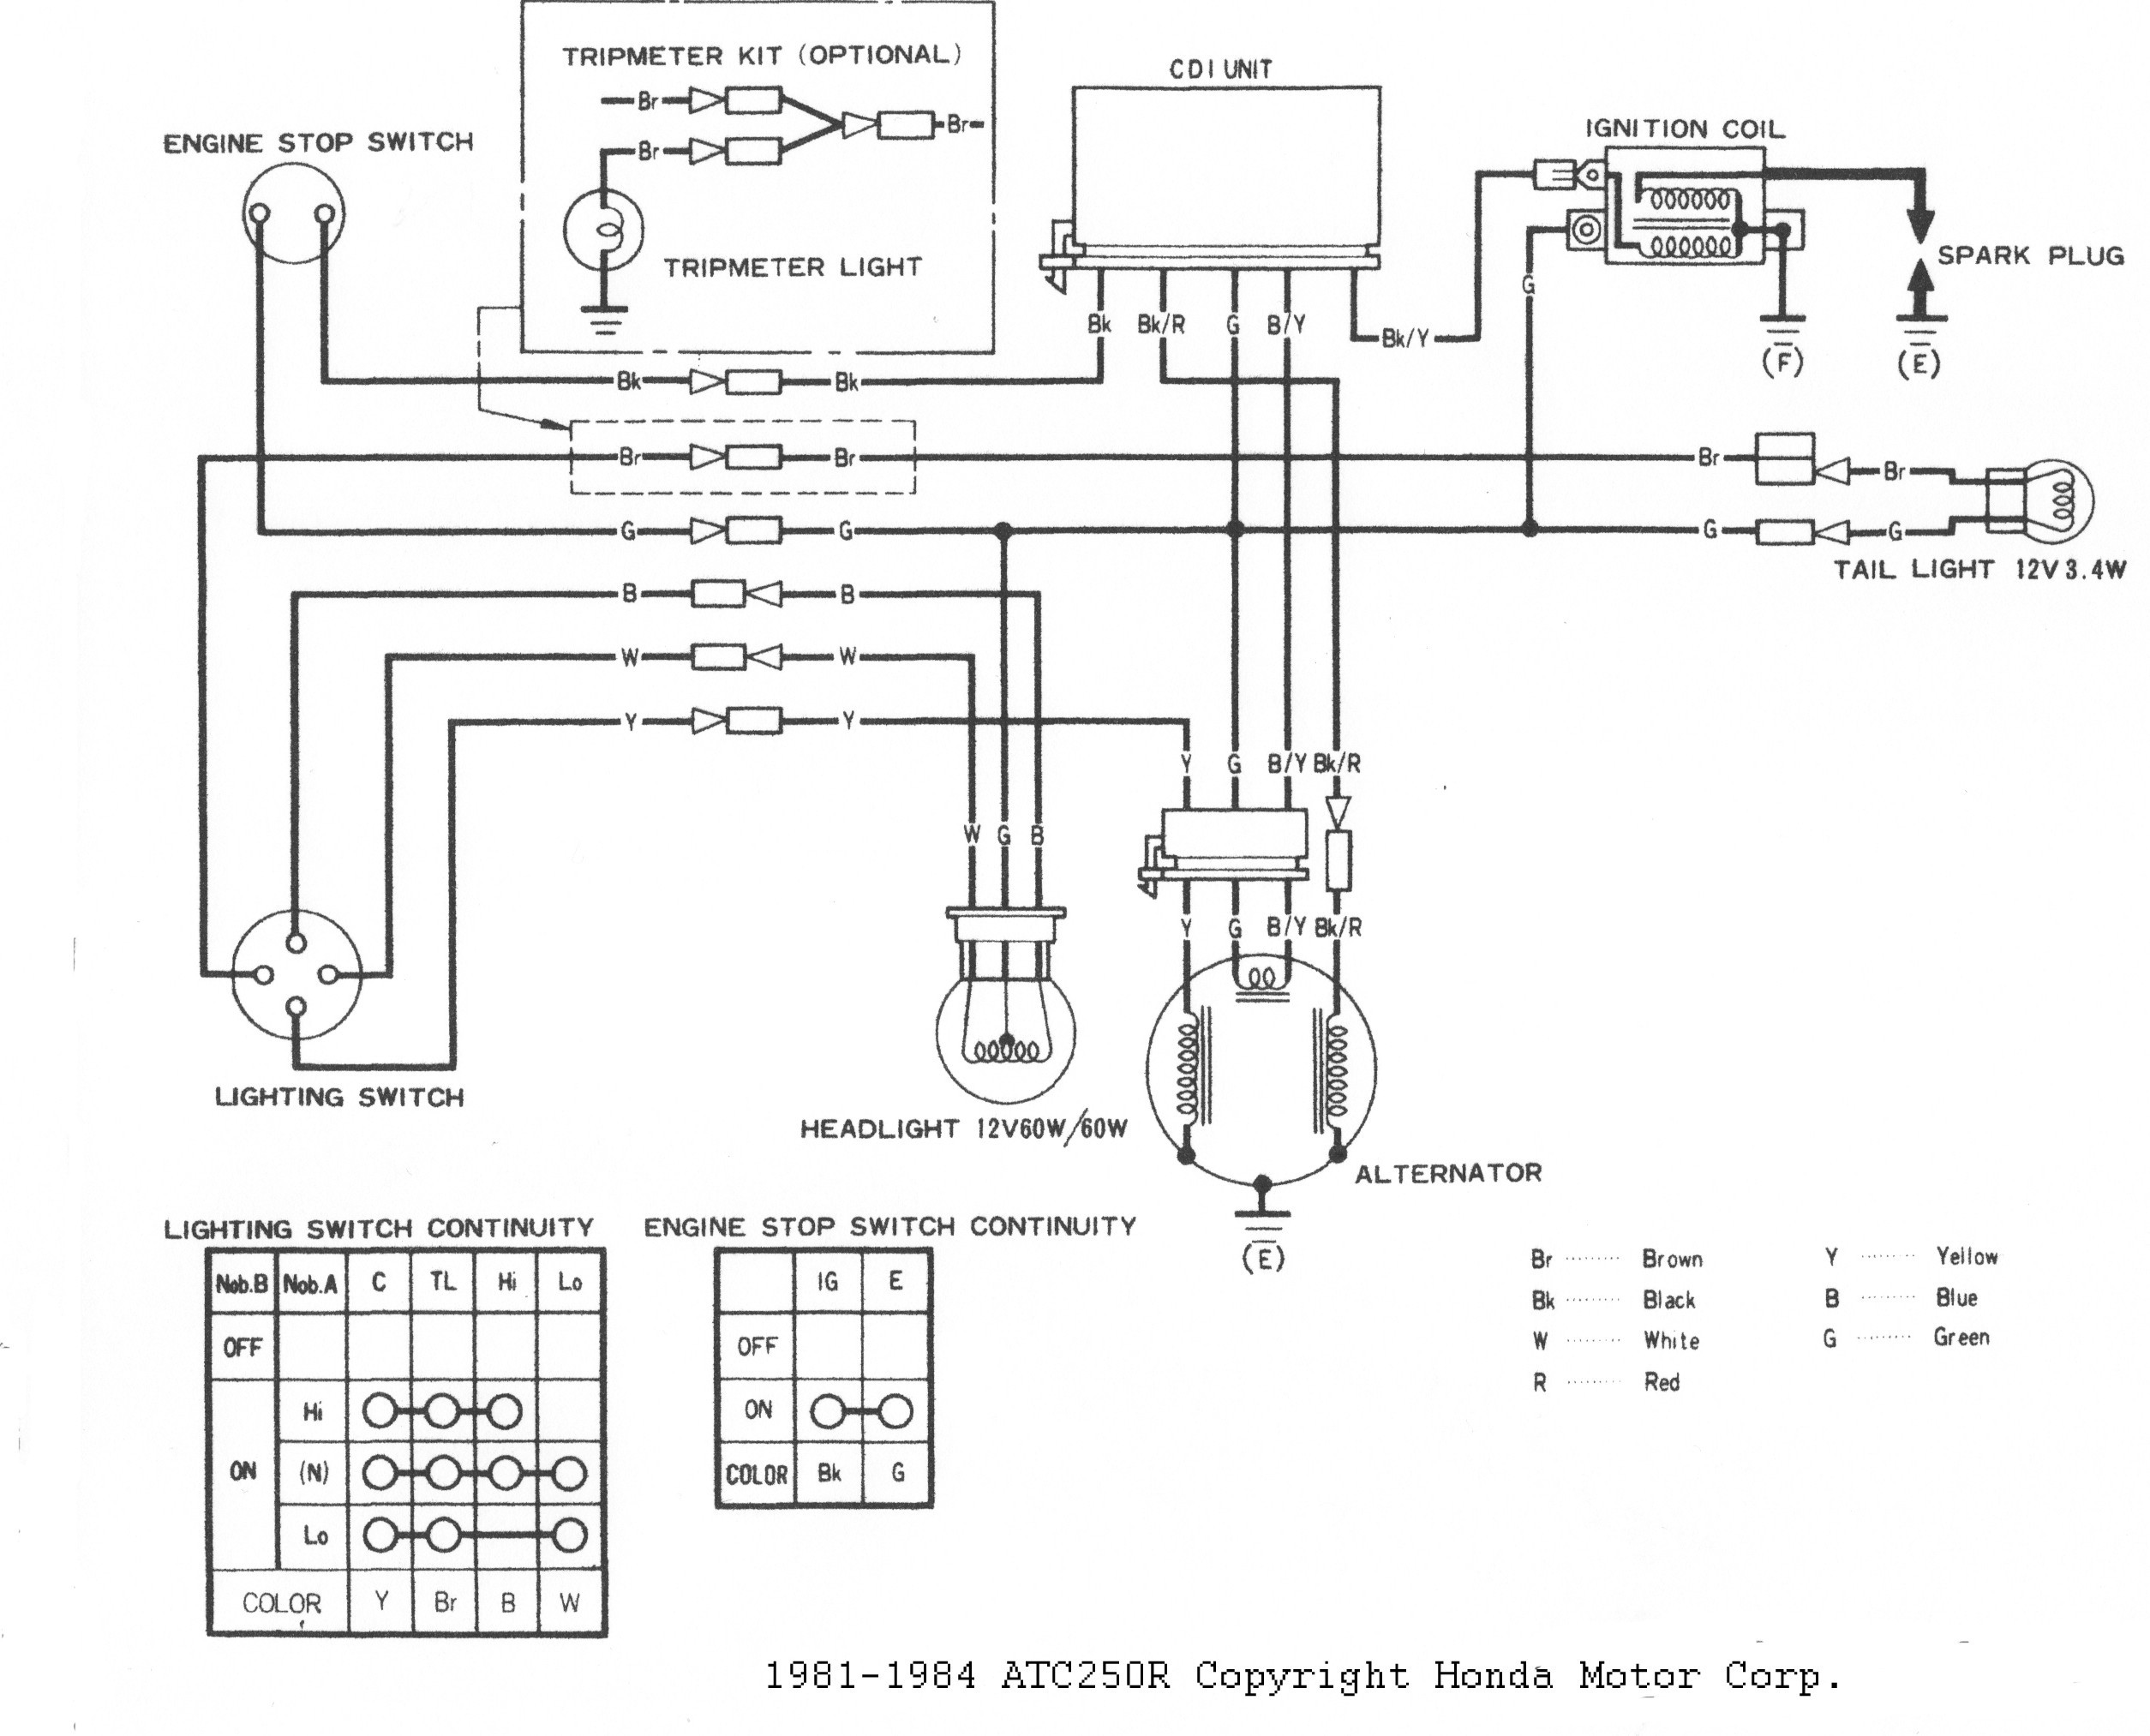 Tecumseh Tc20a-g-404-115 Wiring Diagram Tecumseh Magneto Wiring Diagram Unique Of Tecumseh Tc20a-g-404-115 Wiring Diagram